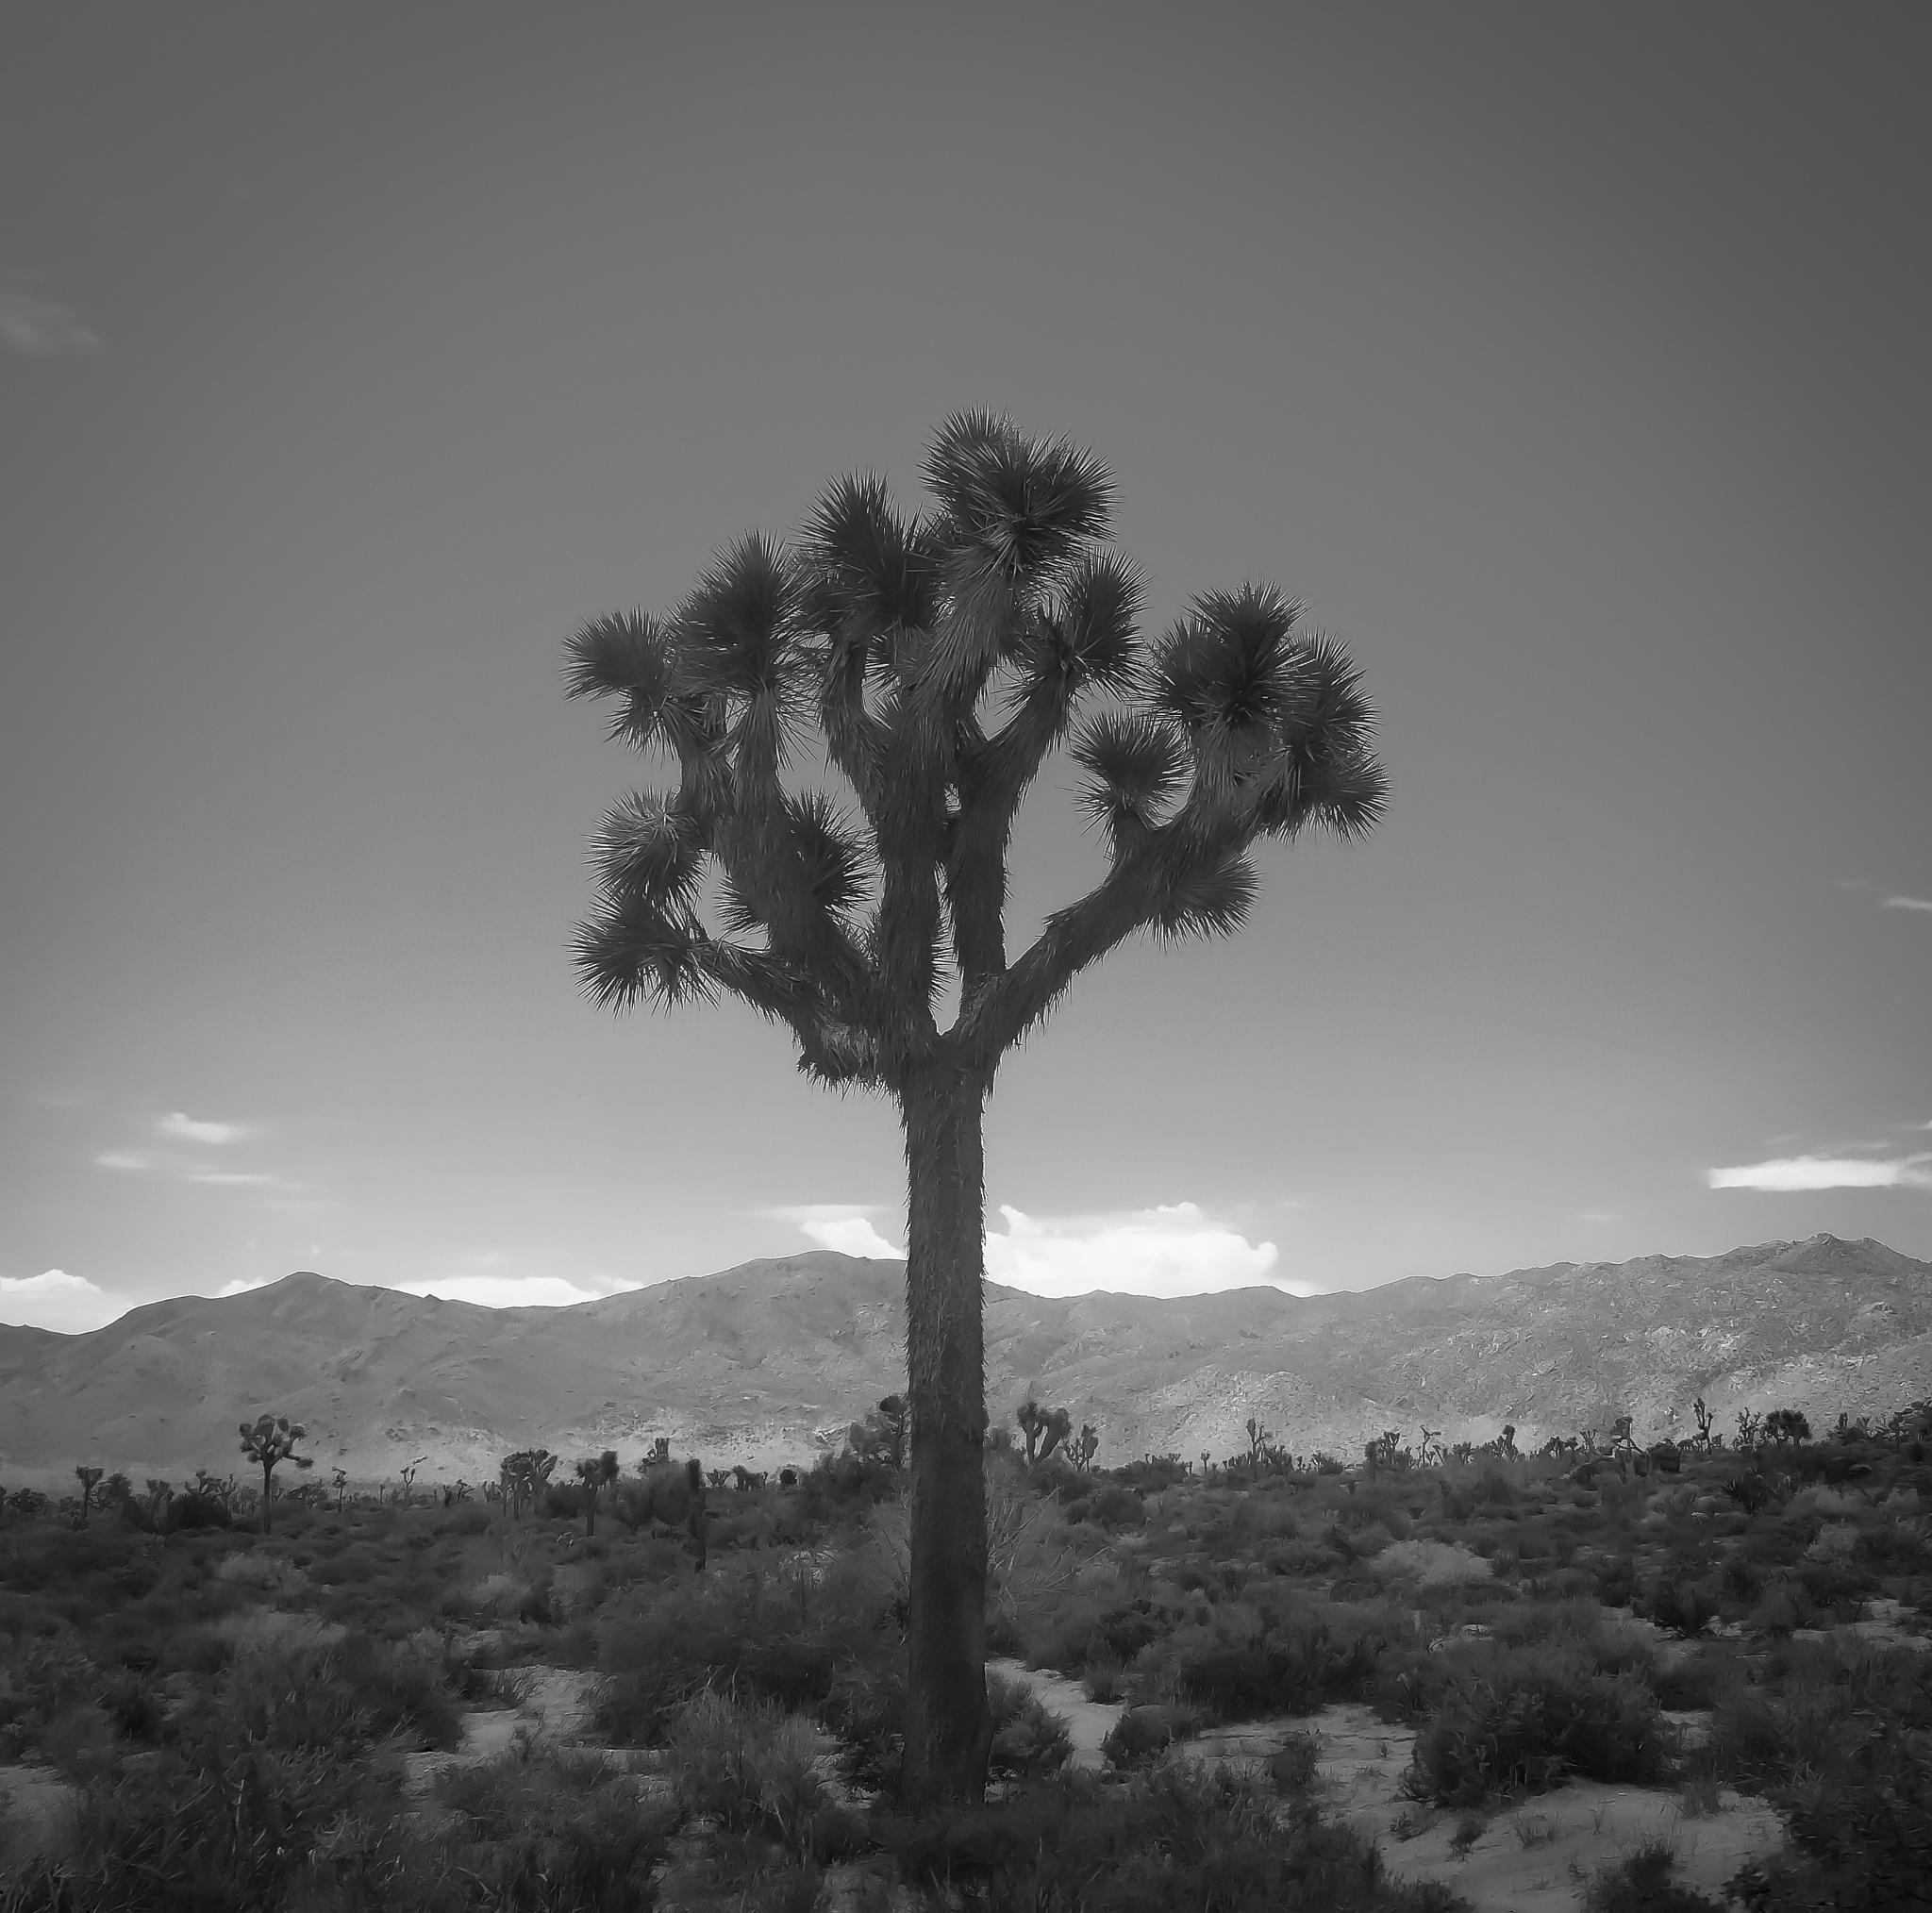 Joshua Tree by Alexander Hug